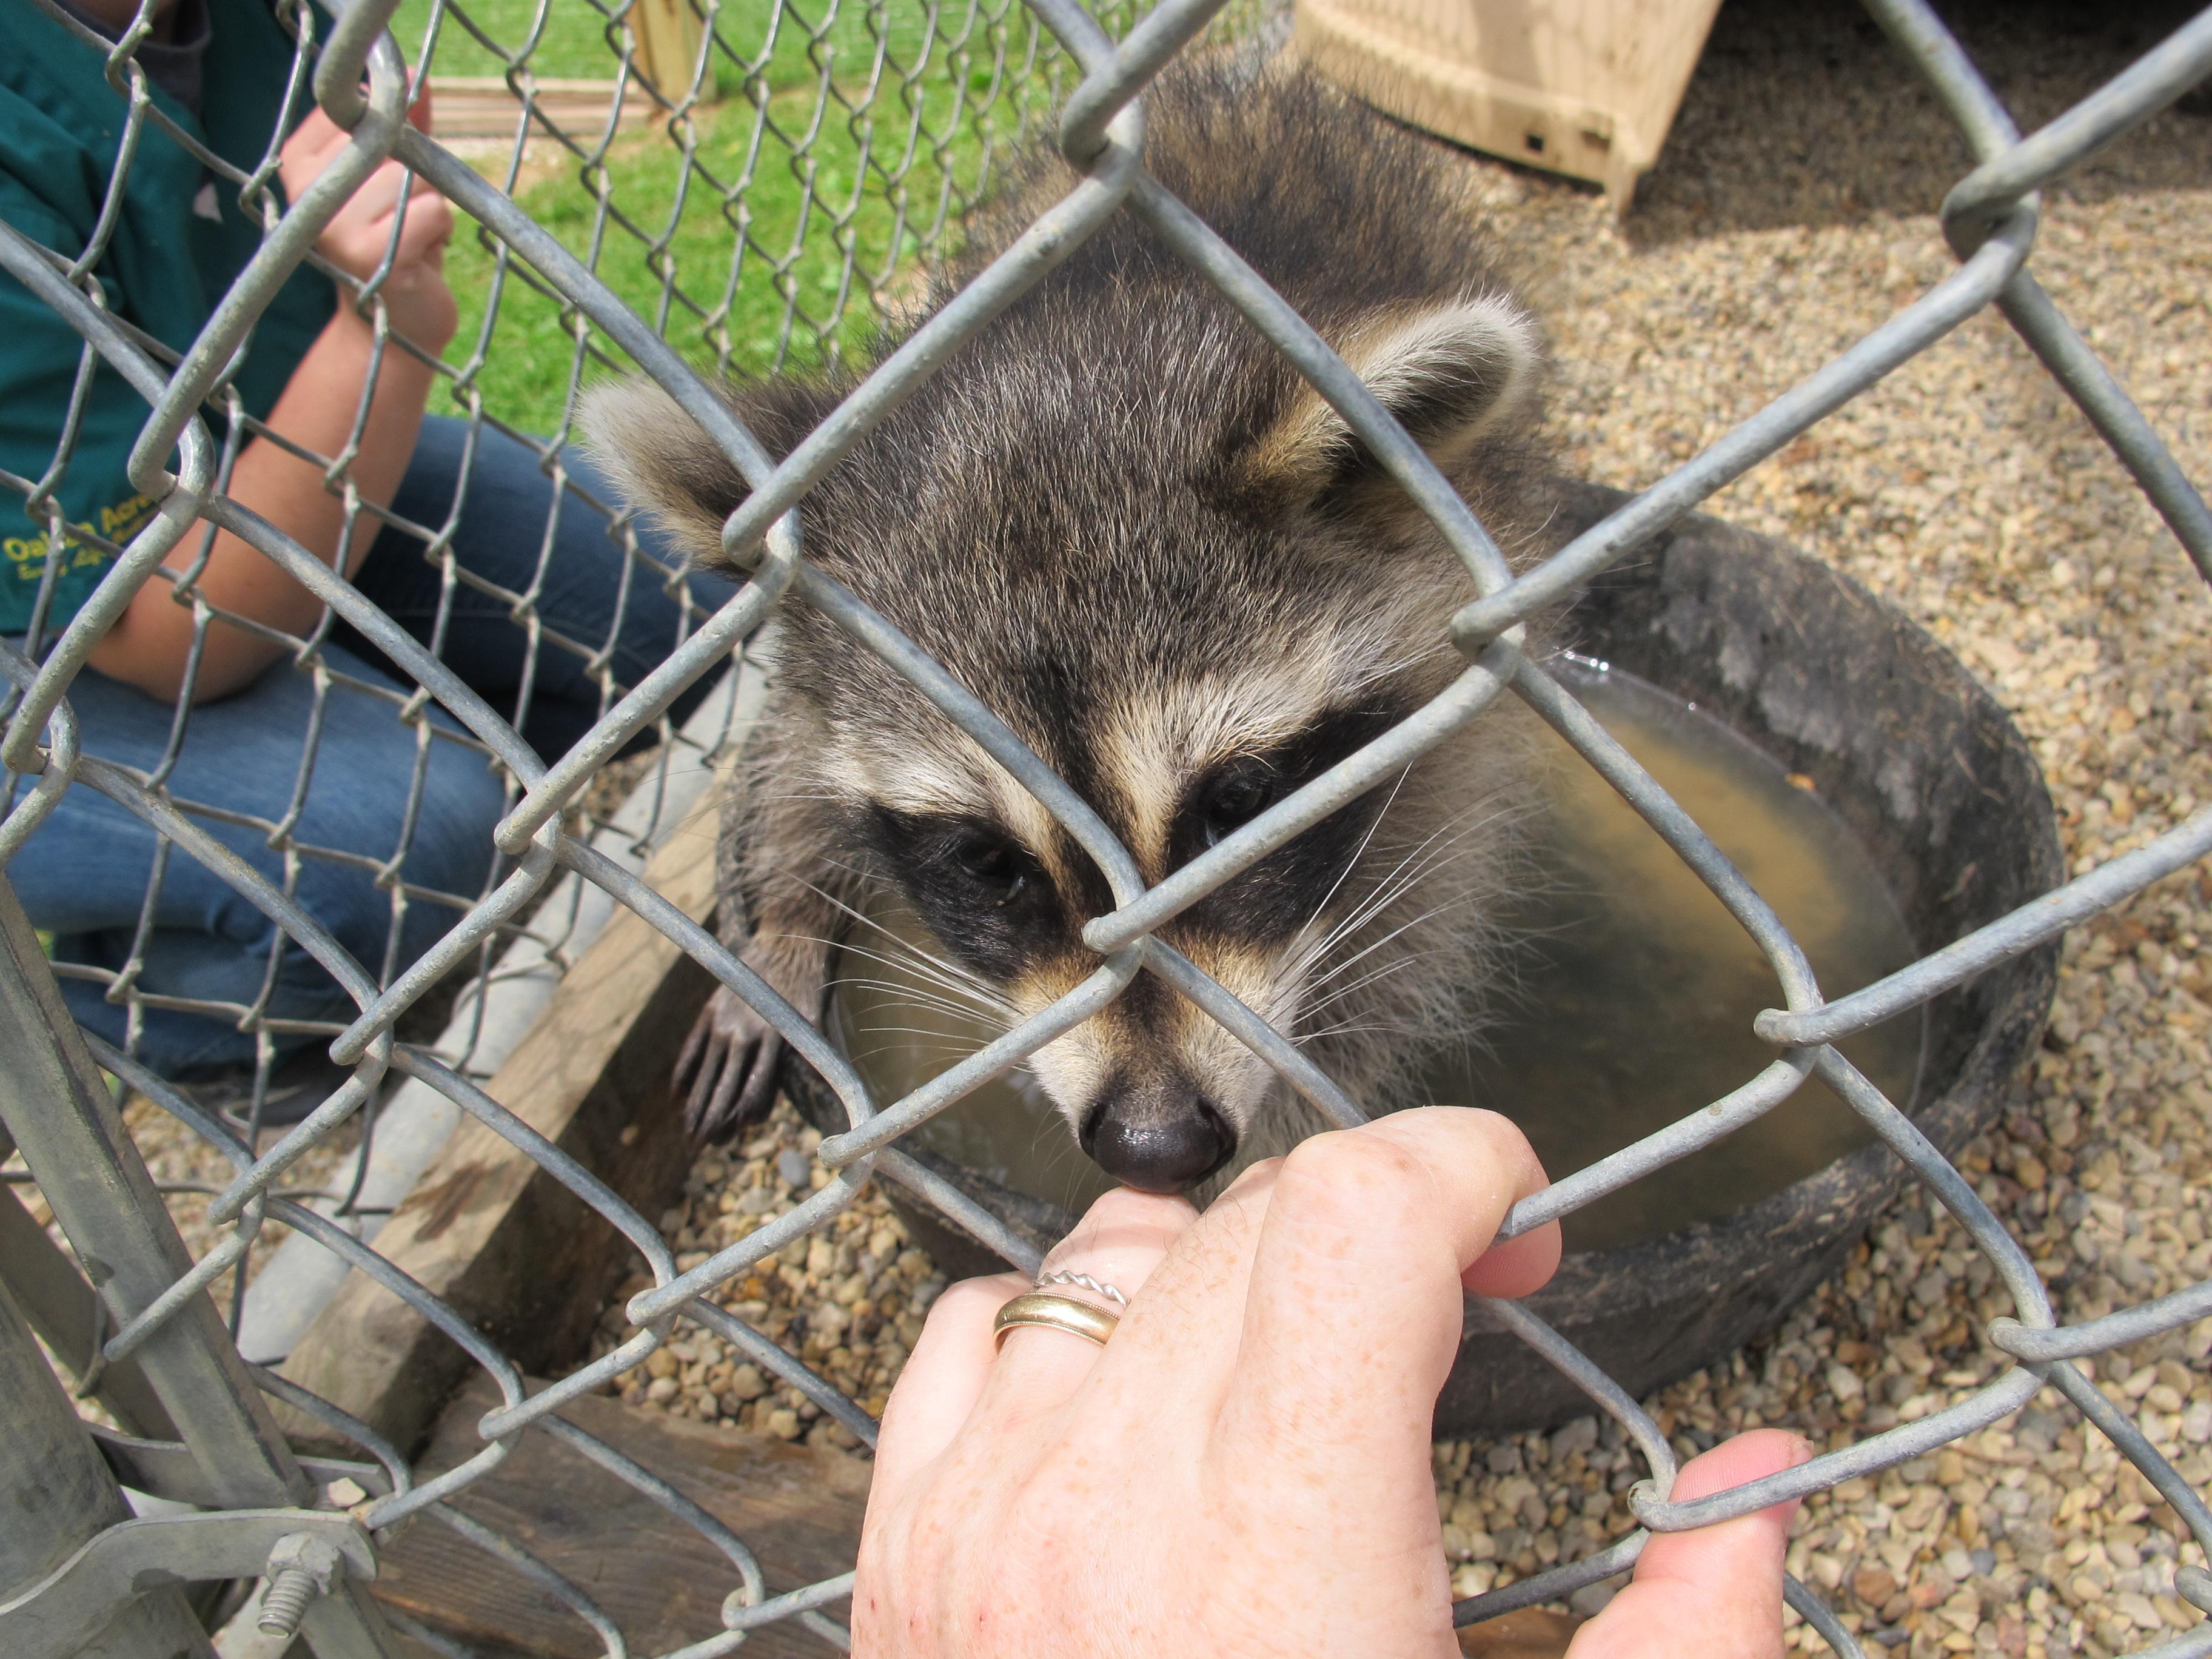 Three-Legged Raccoon 4 by Windthin